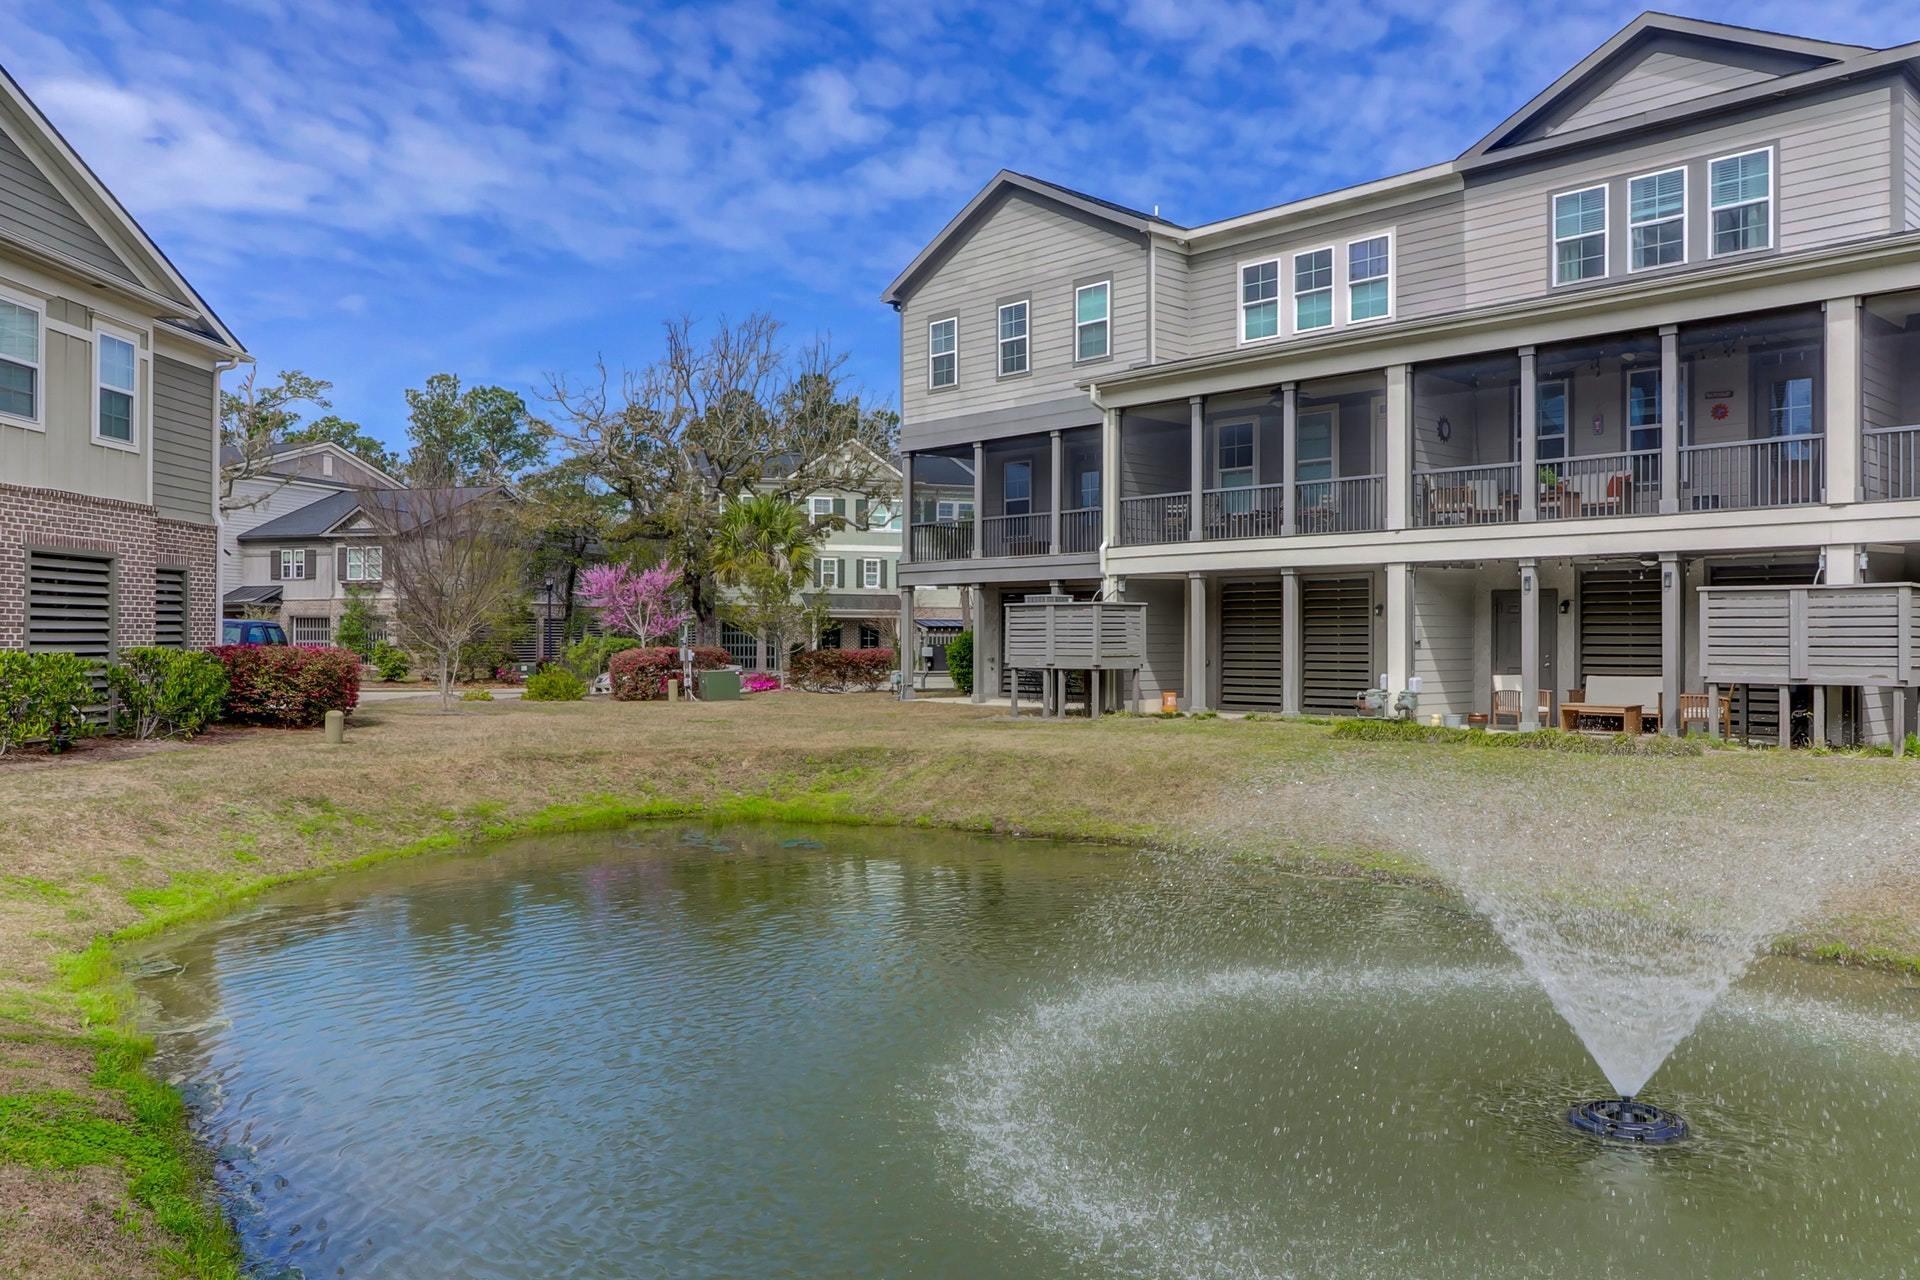 Etiwan Pointe Homes For Sale - 220 Slipper Shell, Mount Pleasant, SC - 9